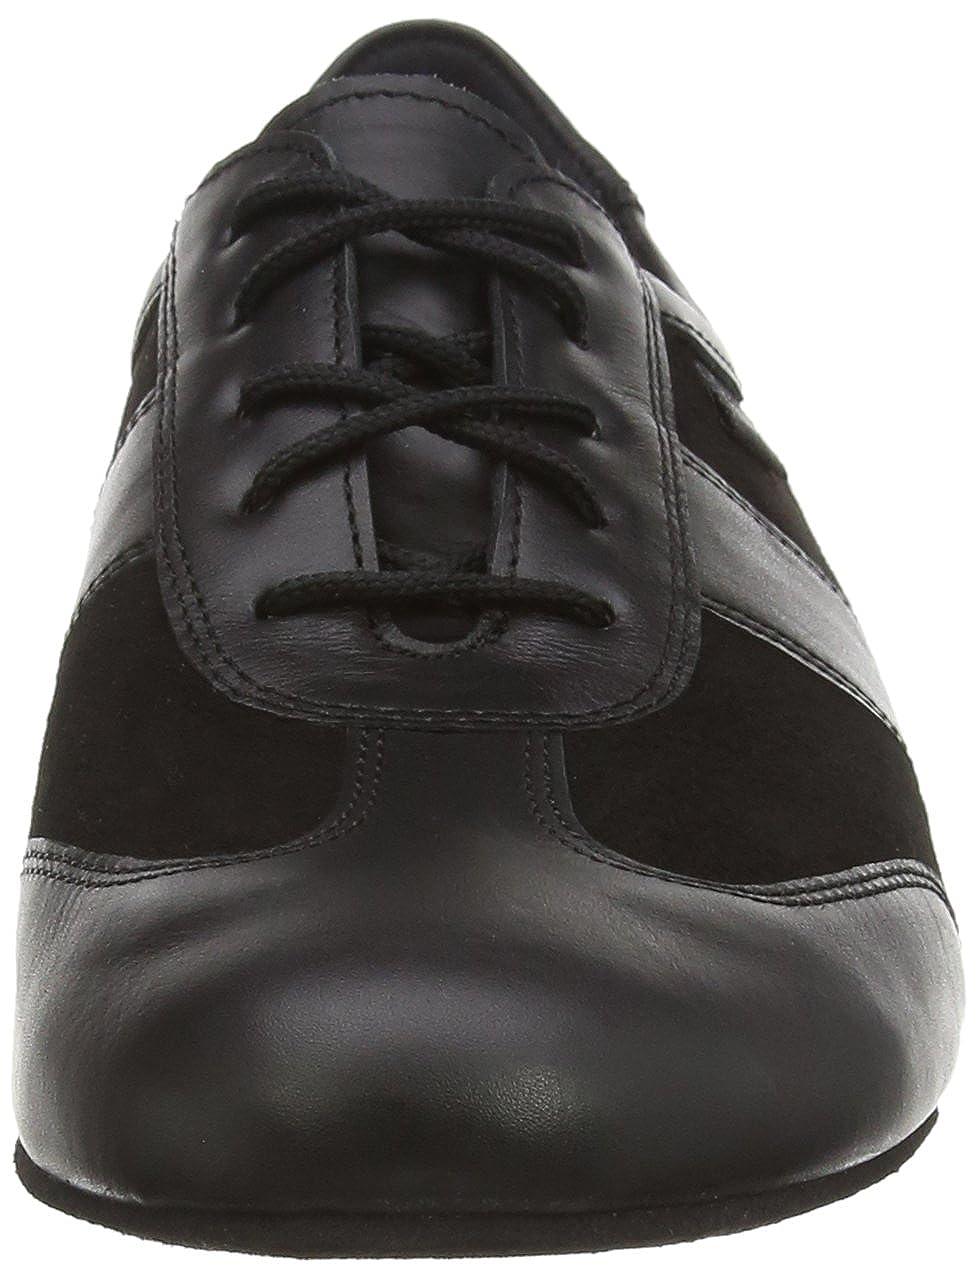 Wide - H Width 9 W US Wedge Heel 8.5 UK Diamant Mens Model 123 Dance Sneaker- 1 2.5 cm